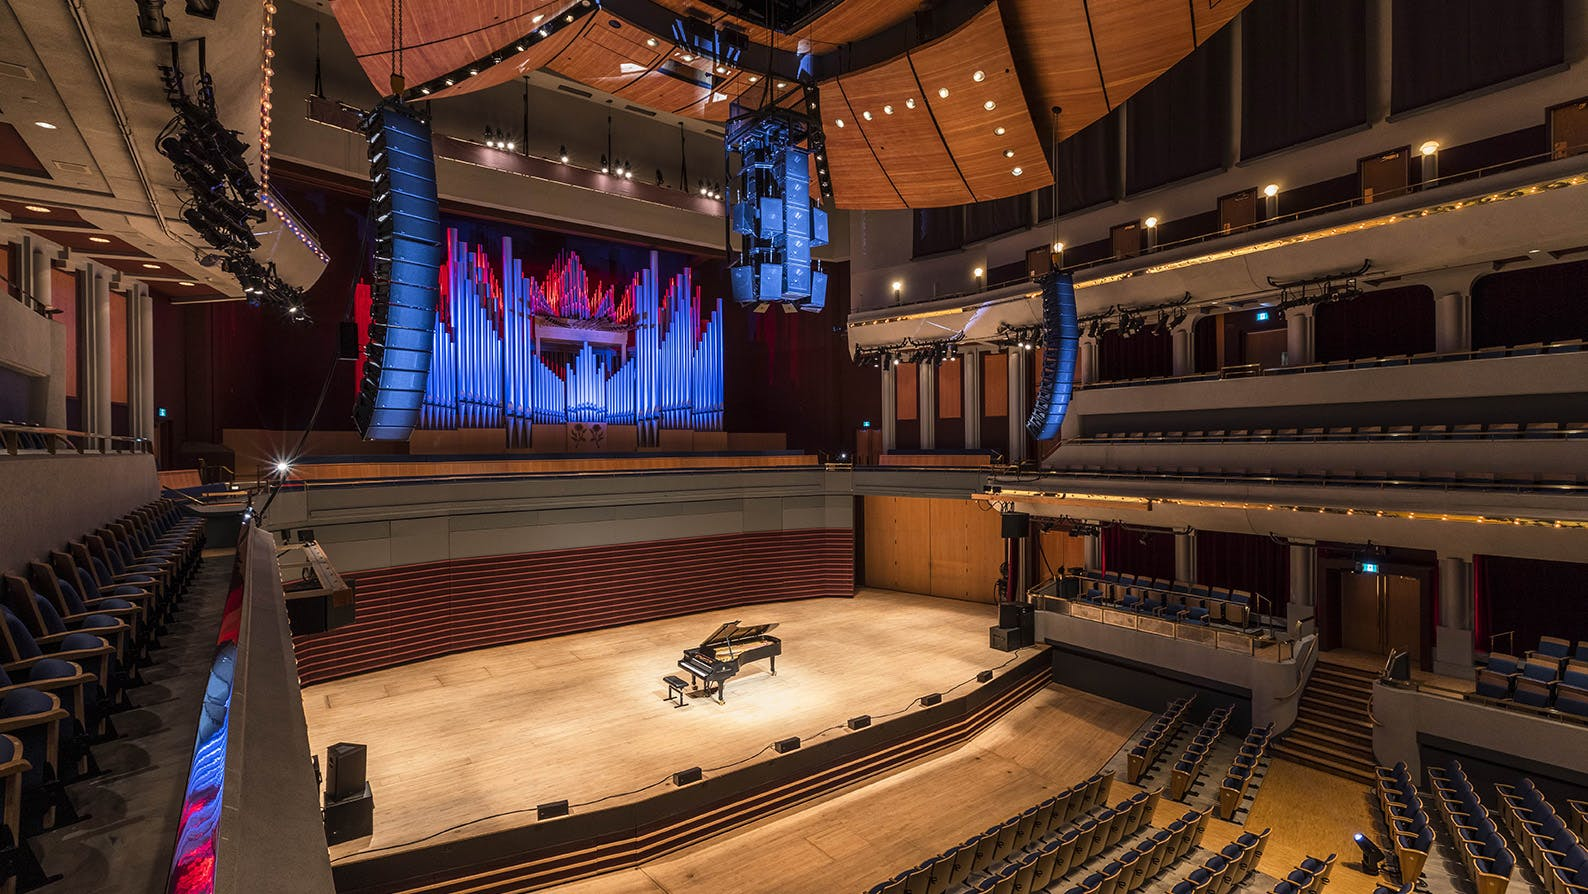 Jack Singer Concert Hall audio visual enhancements